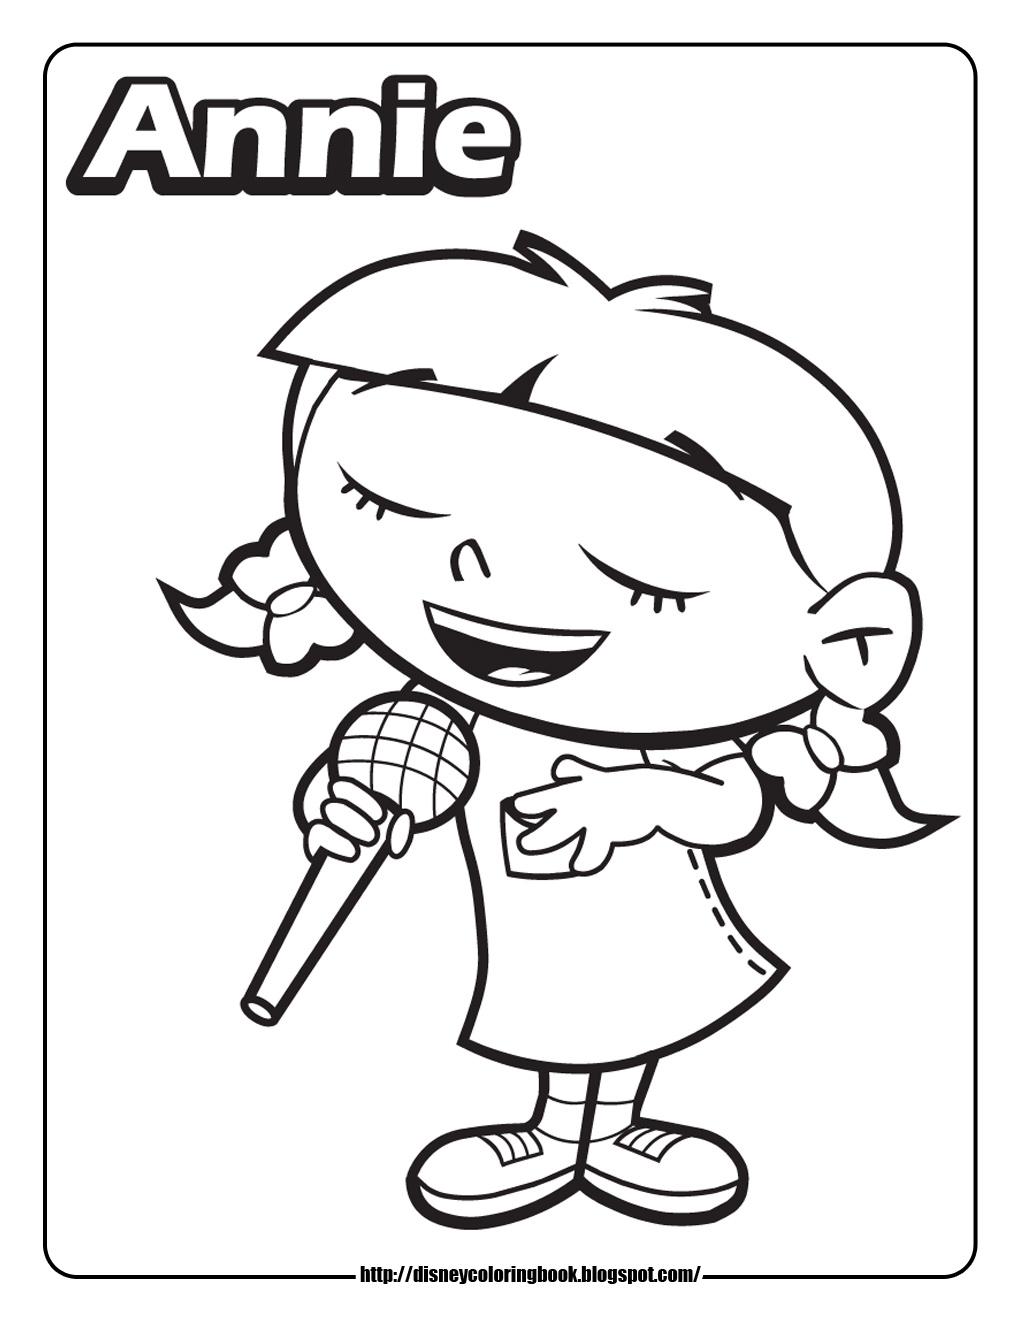 1020x1320 Unique Little Einsteins Coloring Pages Logo And Design Ideas